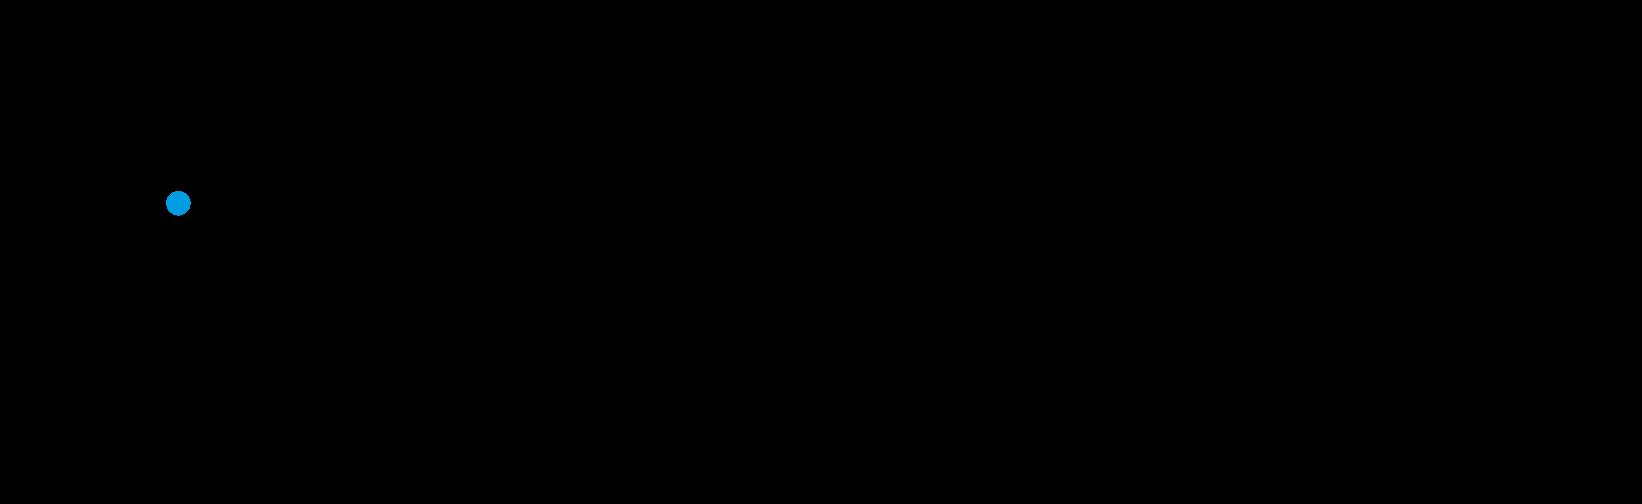 igenyes_ferfi_logo_with_tagline